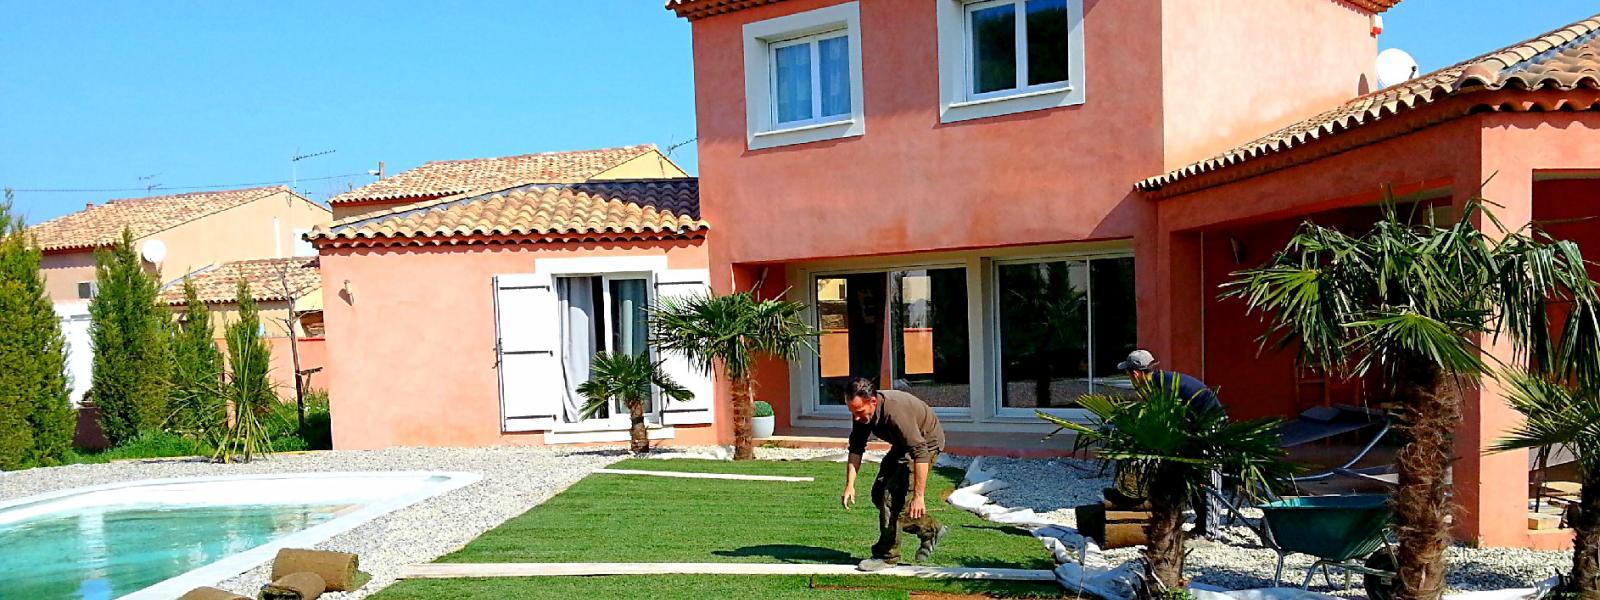 Paysagiste p pini riste marseille cr ation jardin vente - Plantes bassin de lagunage aixen provence ...